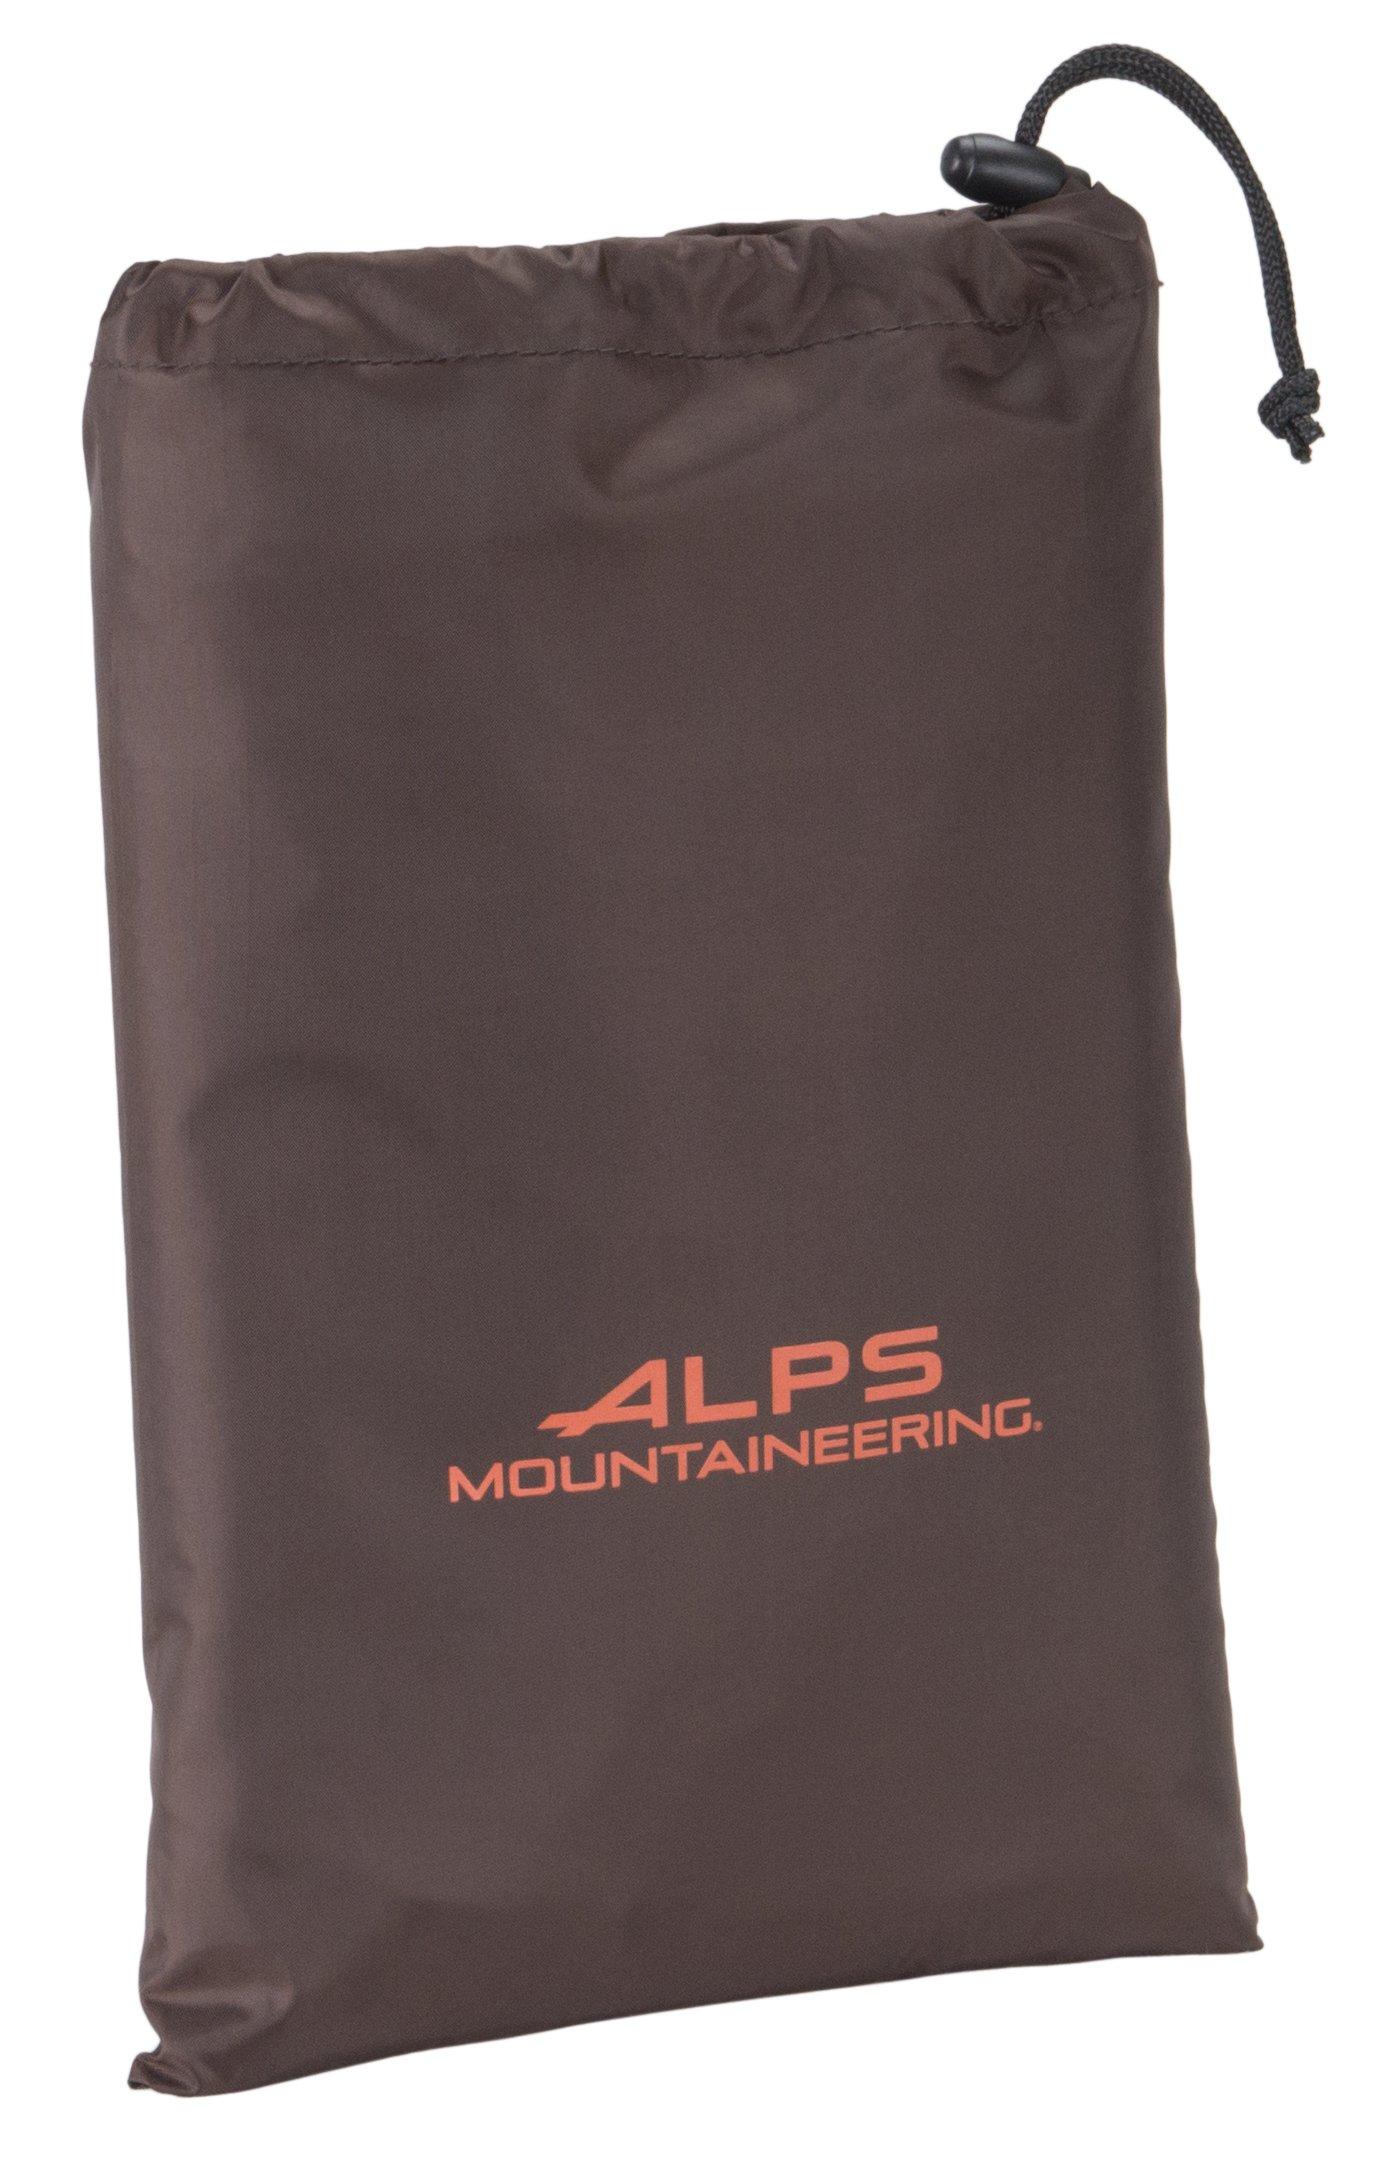 ALPS Mountaineering Lynx 1-Person Tent Floor Saver.